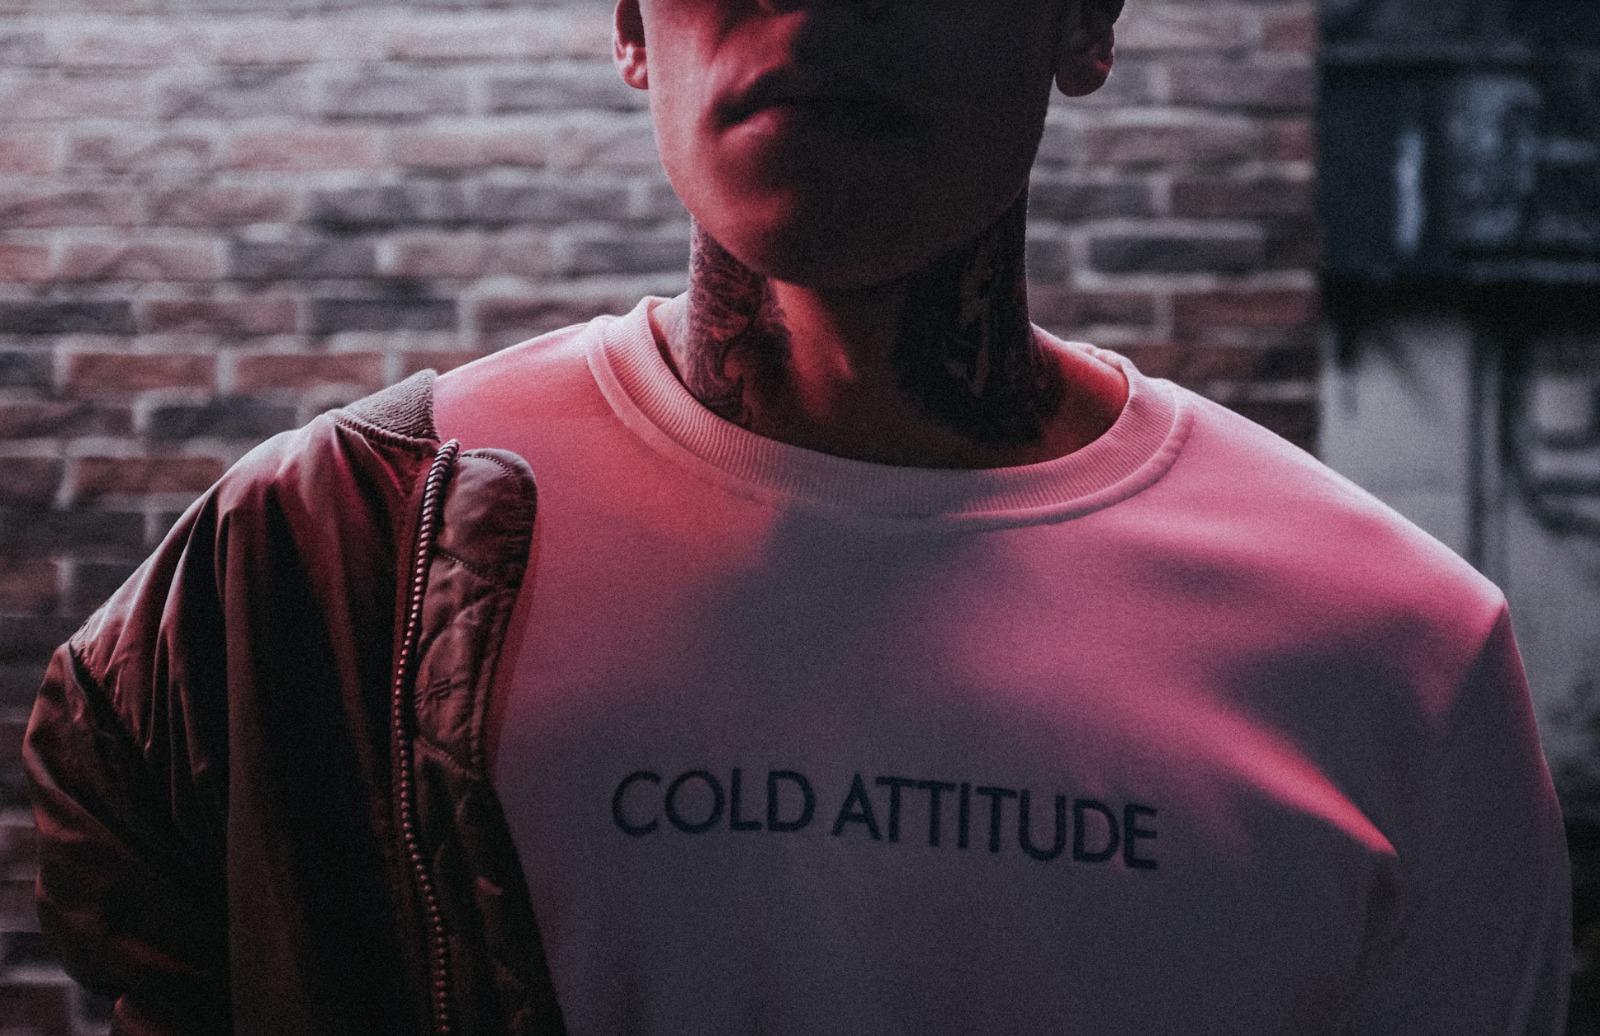 Cold Attitude Crewneck